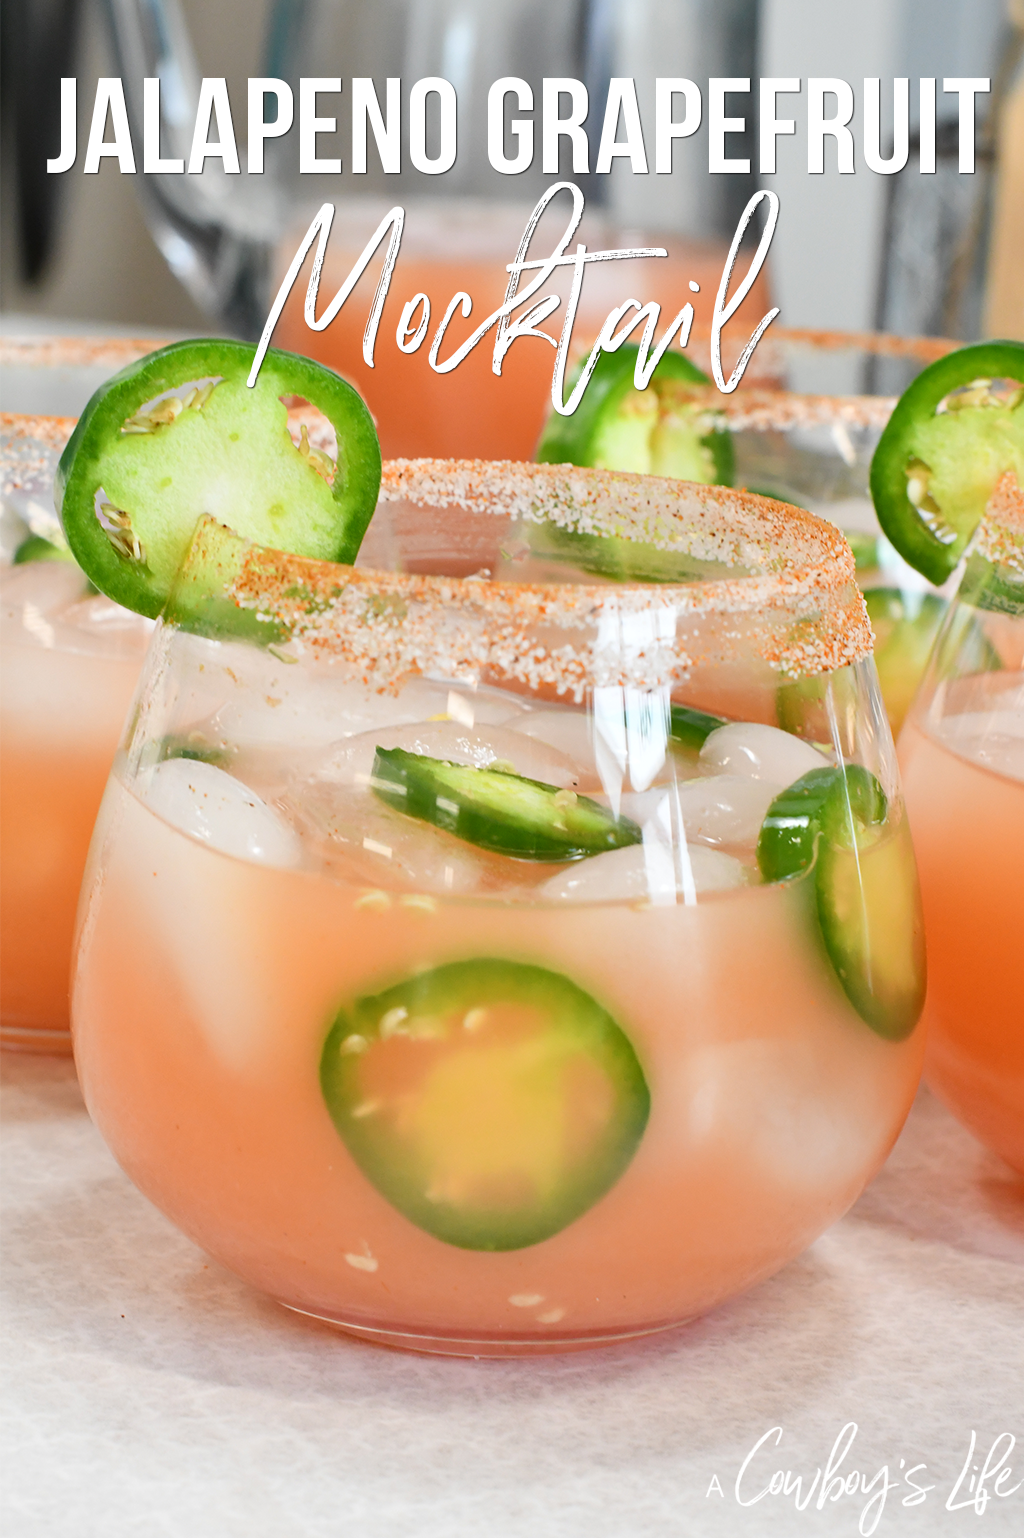 Jalapeño Grapefruit Mocktail | Jalapeño Mocktail | Jalapeño Grapefruit Cocktail | Summer Cocktails | Summer Mocktails #spicycocktails #jalapenomocktail #jalapenococktail